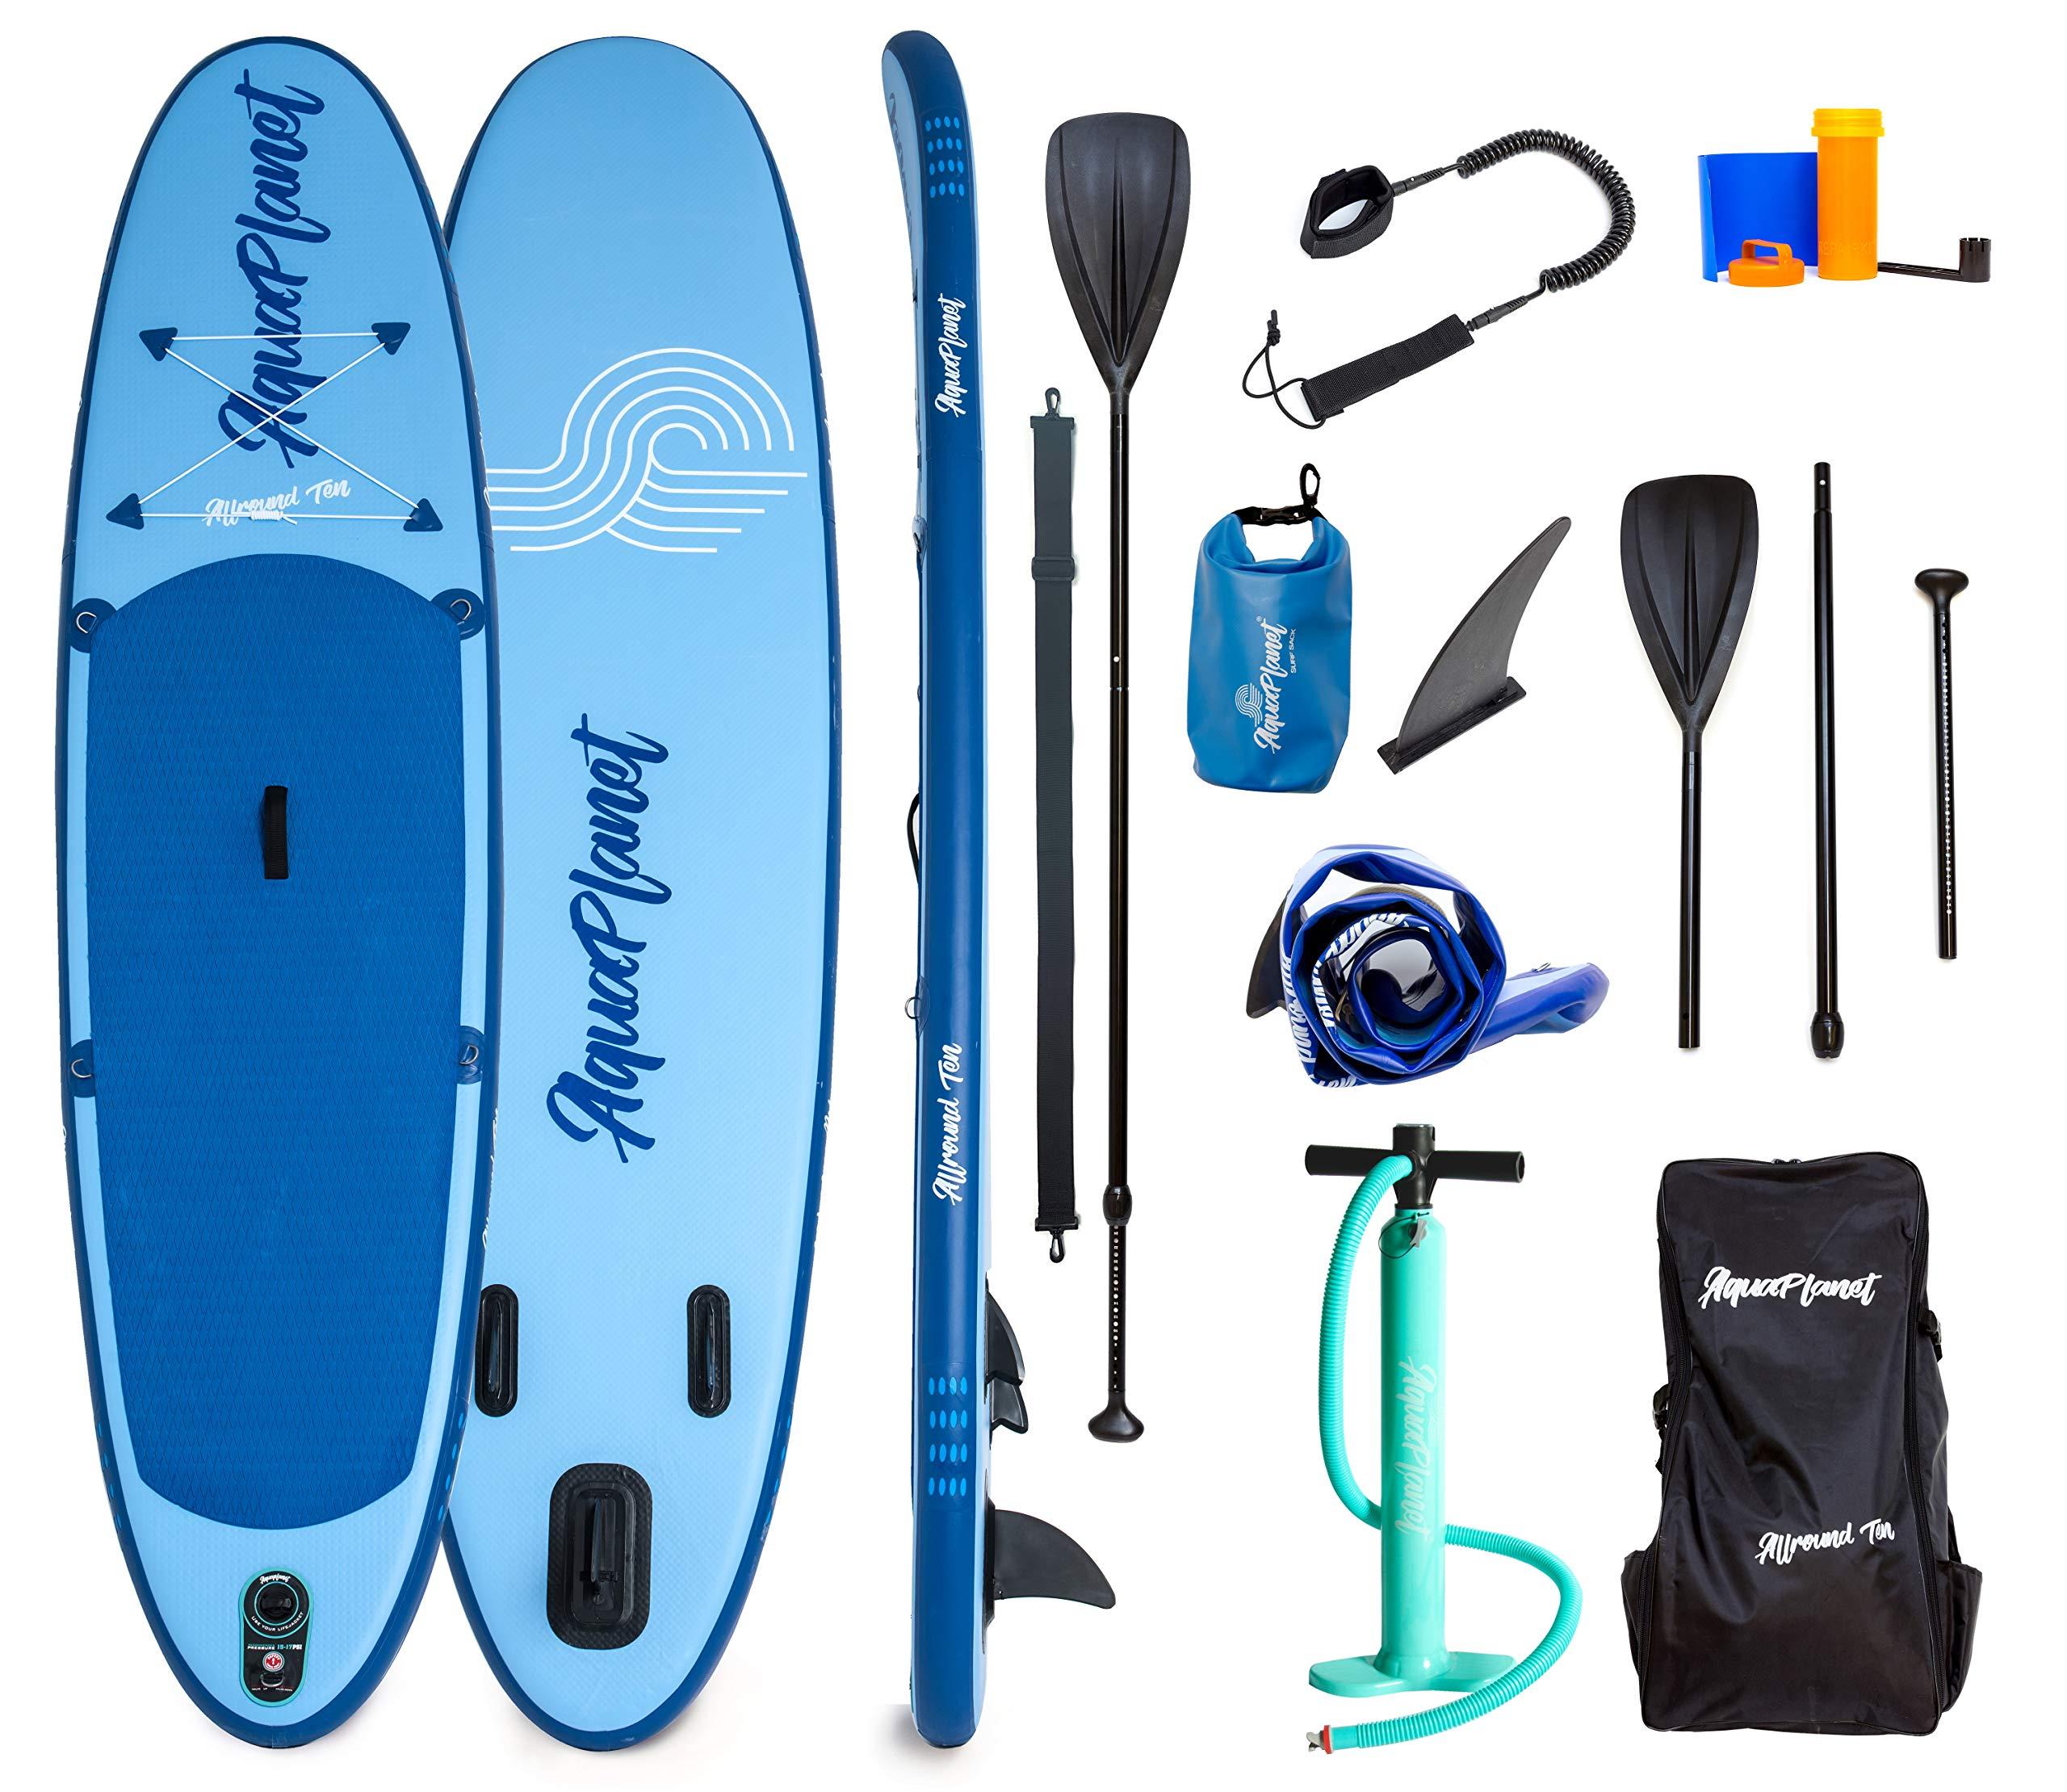 Aquaplanet 10ft Allround Paddle Board - Beginner's Kit. Air Pump with Pressure Gauge,Adjustable Aluminium Floating Paddle,Repair Kit,Heavy Duty Carry Rucksack & Premium Leash & 4 Kayak Seat Rings by Aquaplanet